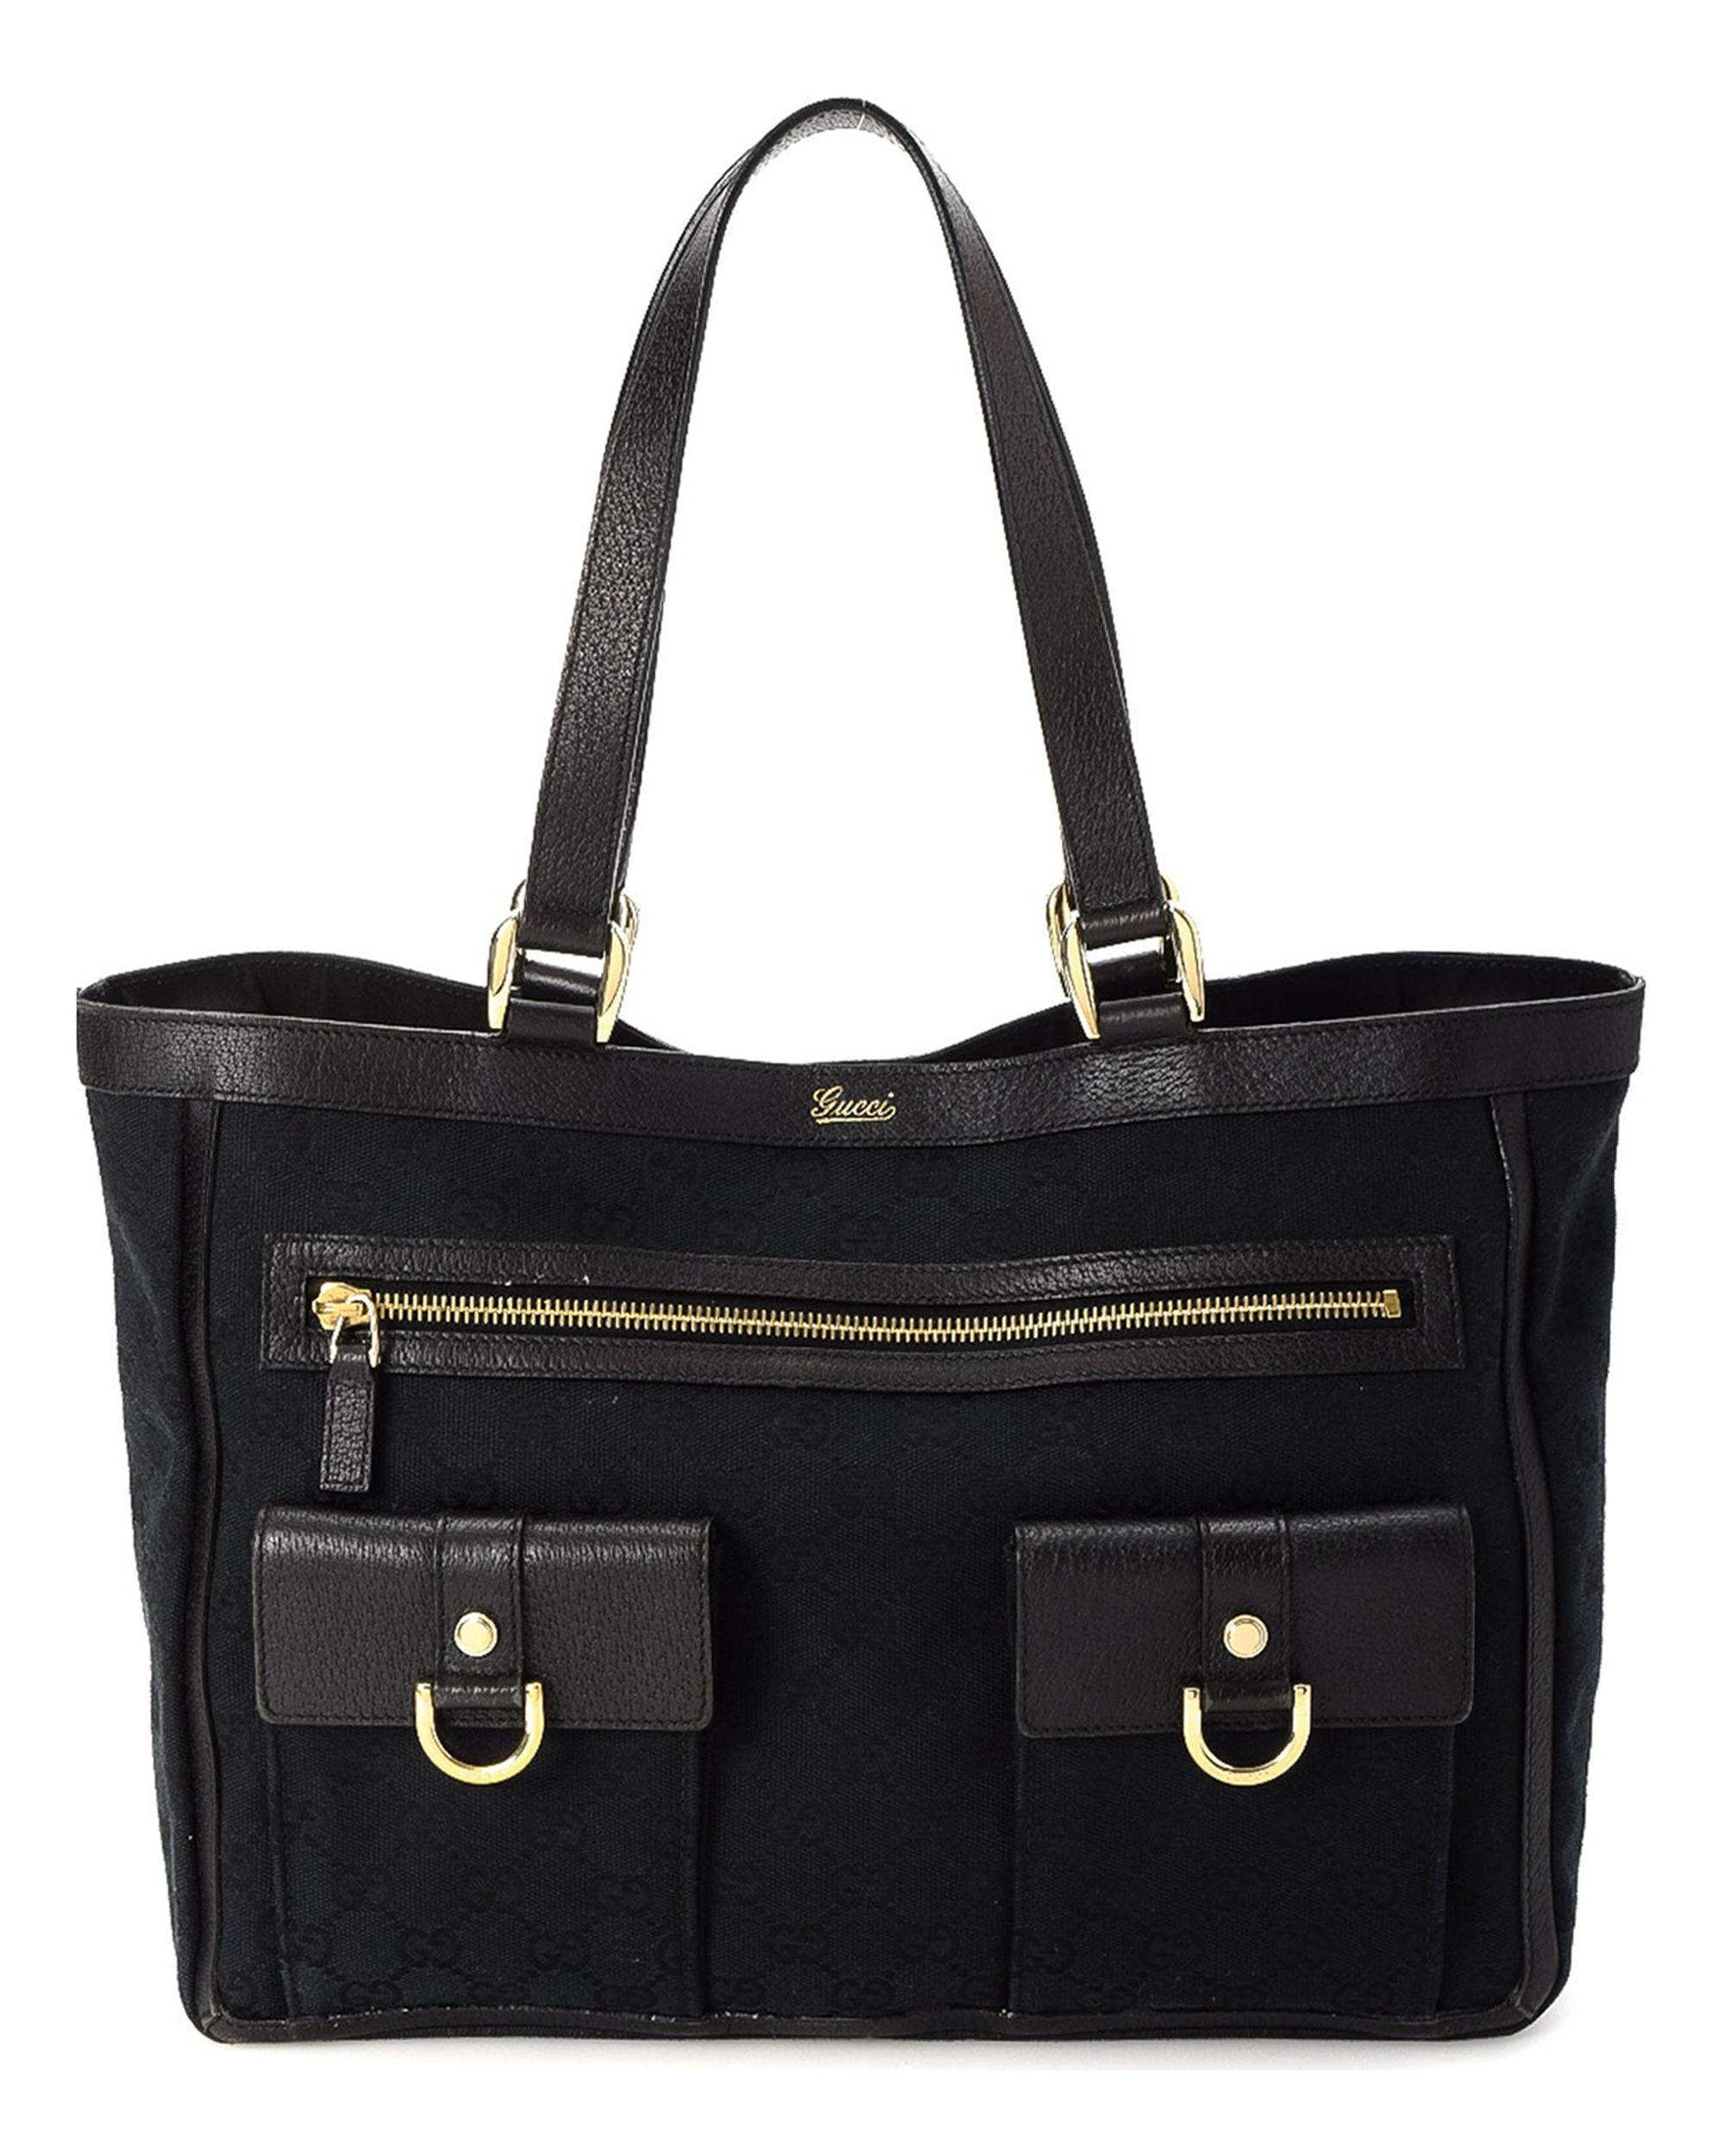 4f0cb7270ce Gucci - Black GG Canvas Abbey Tote - Vintage - Lyst. View fullscreen